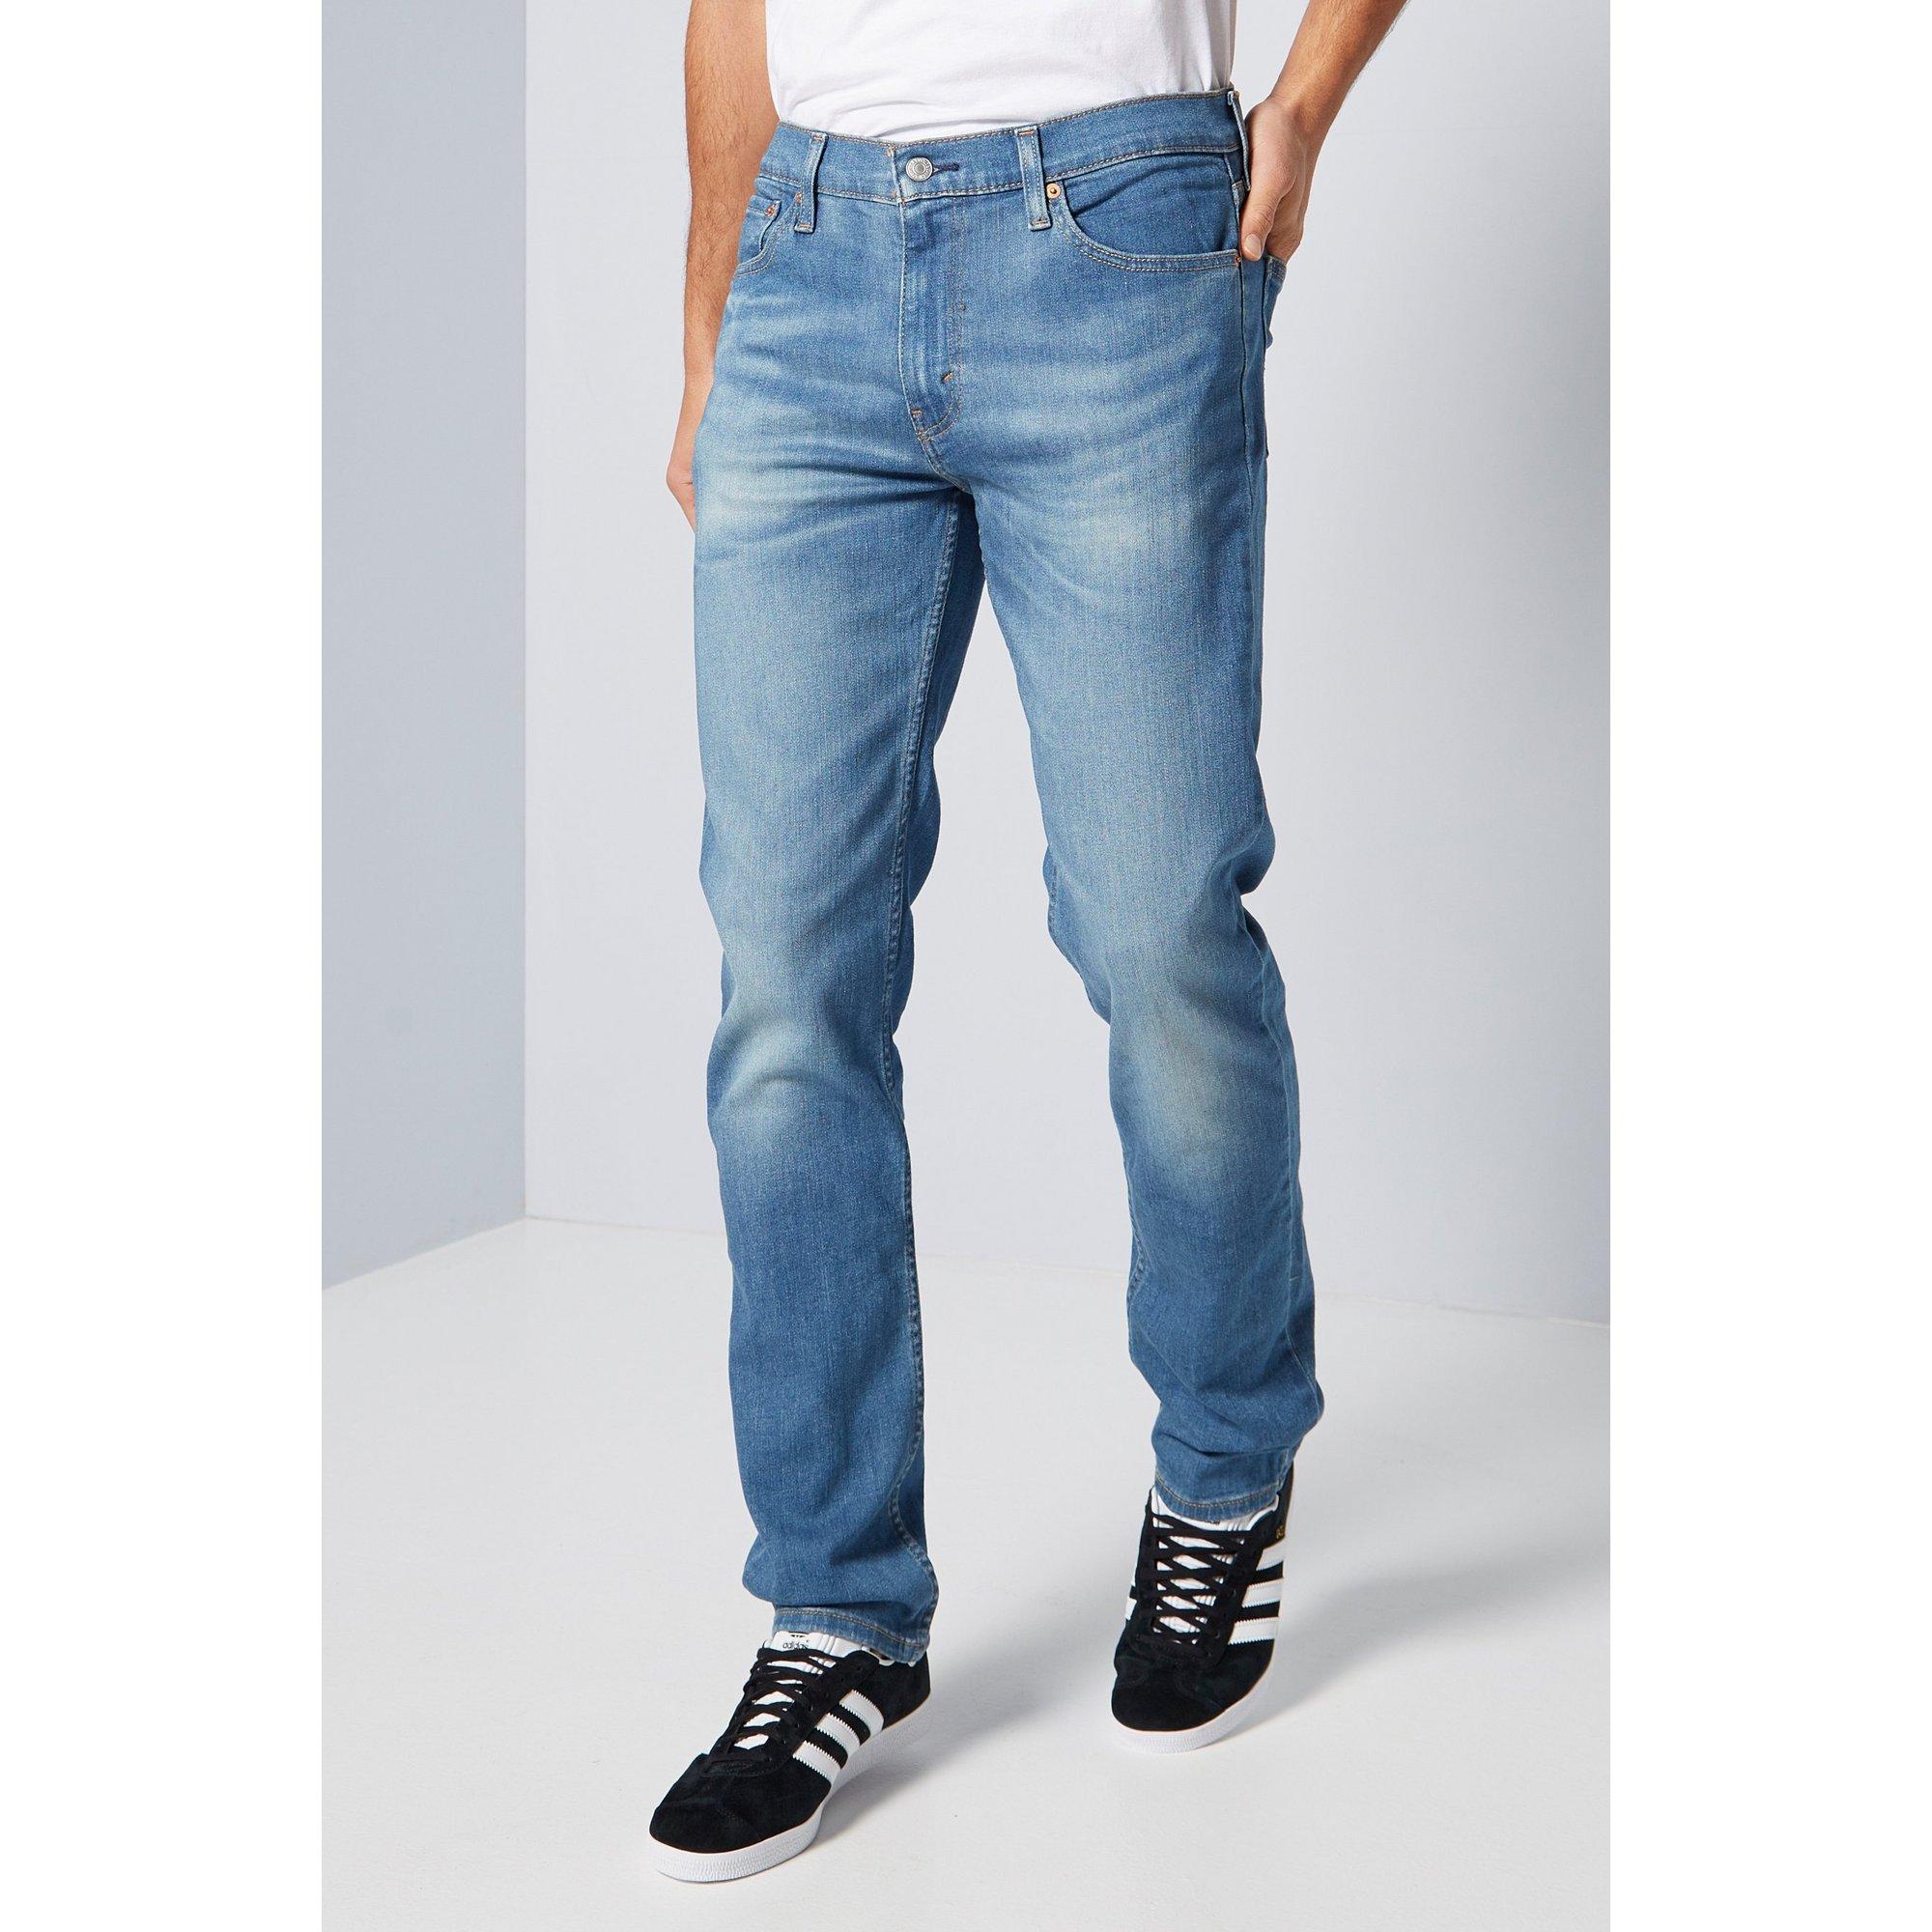 Image of Levi 511 Mid Wash Slim Fit Jeans